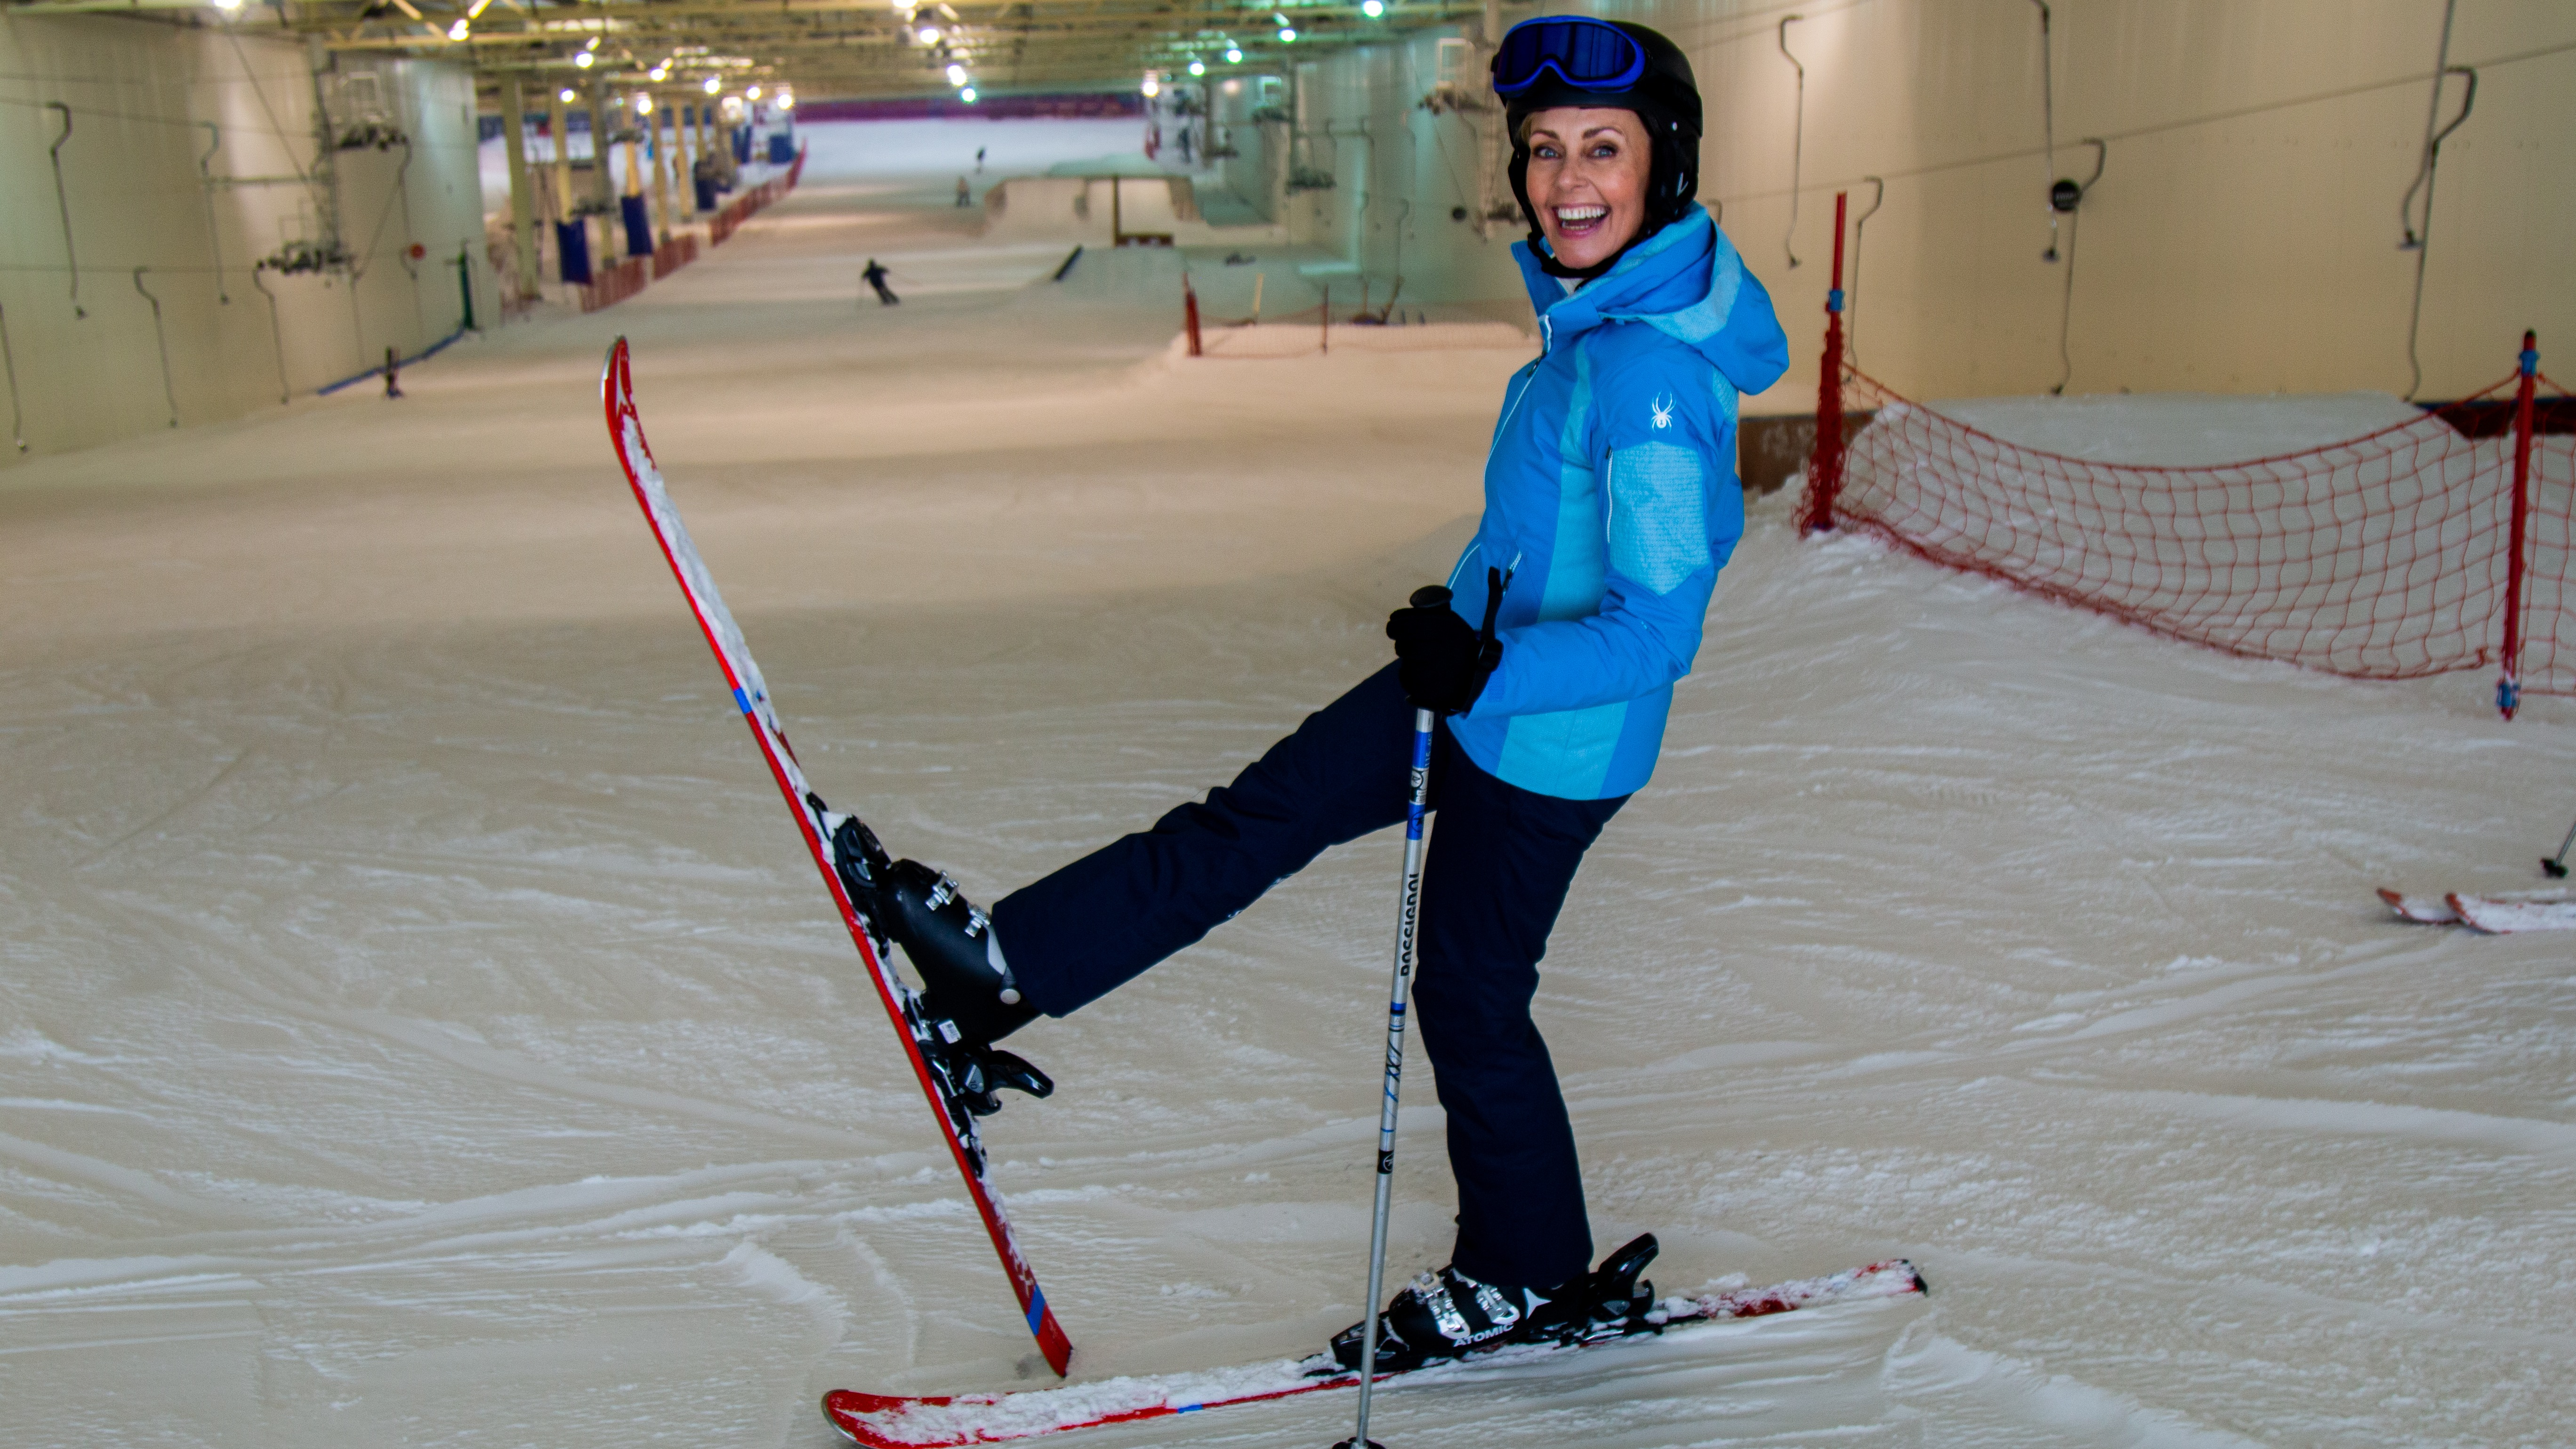 Rani op ski s